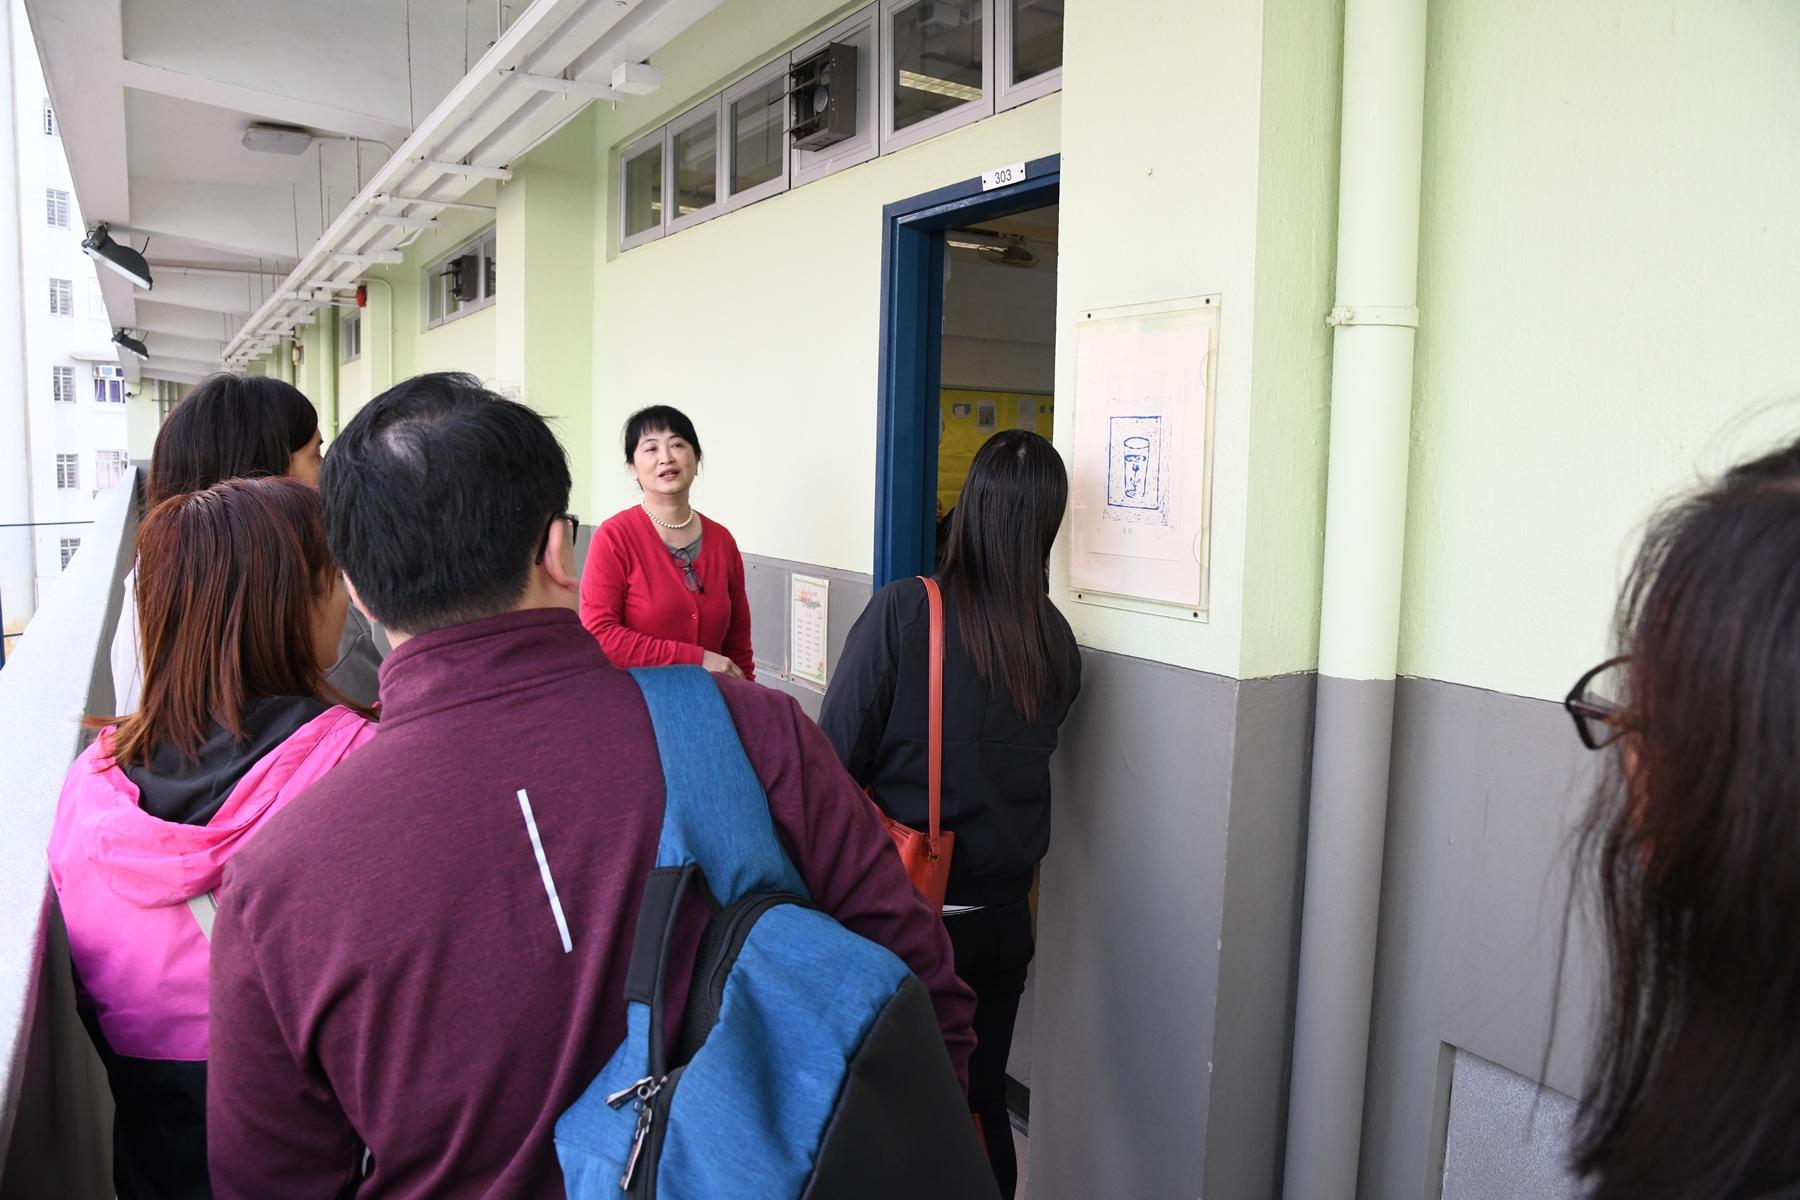 http://npc.edu.hk/sites/default/files/dsc_0166_1.jpg